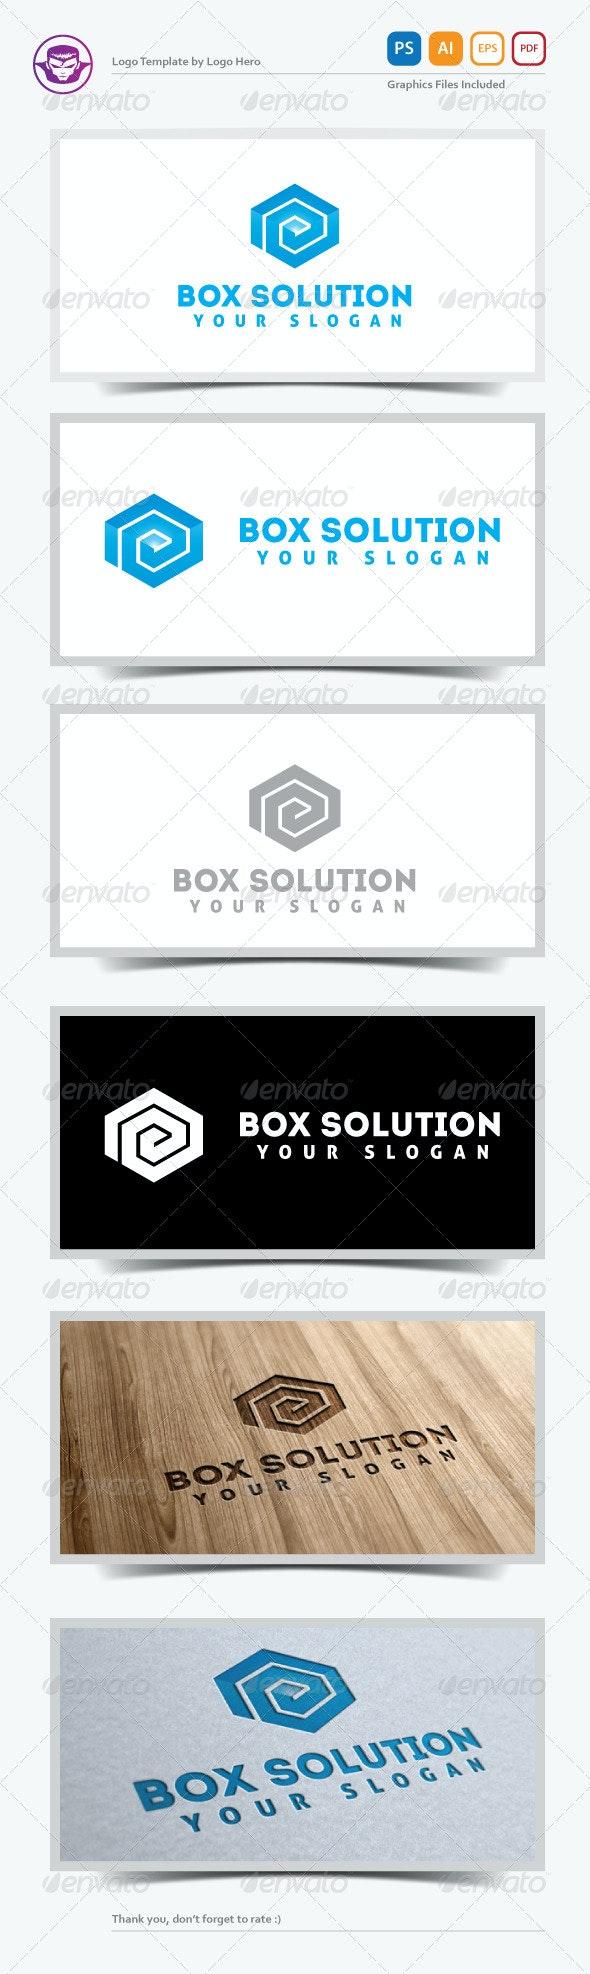 Box Solution Logo Template